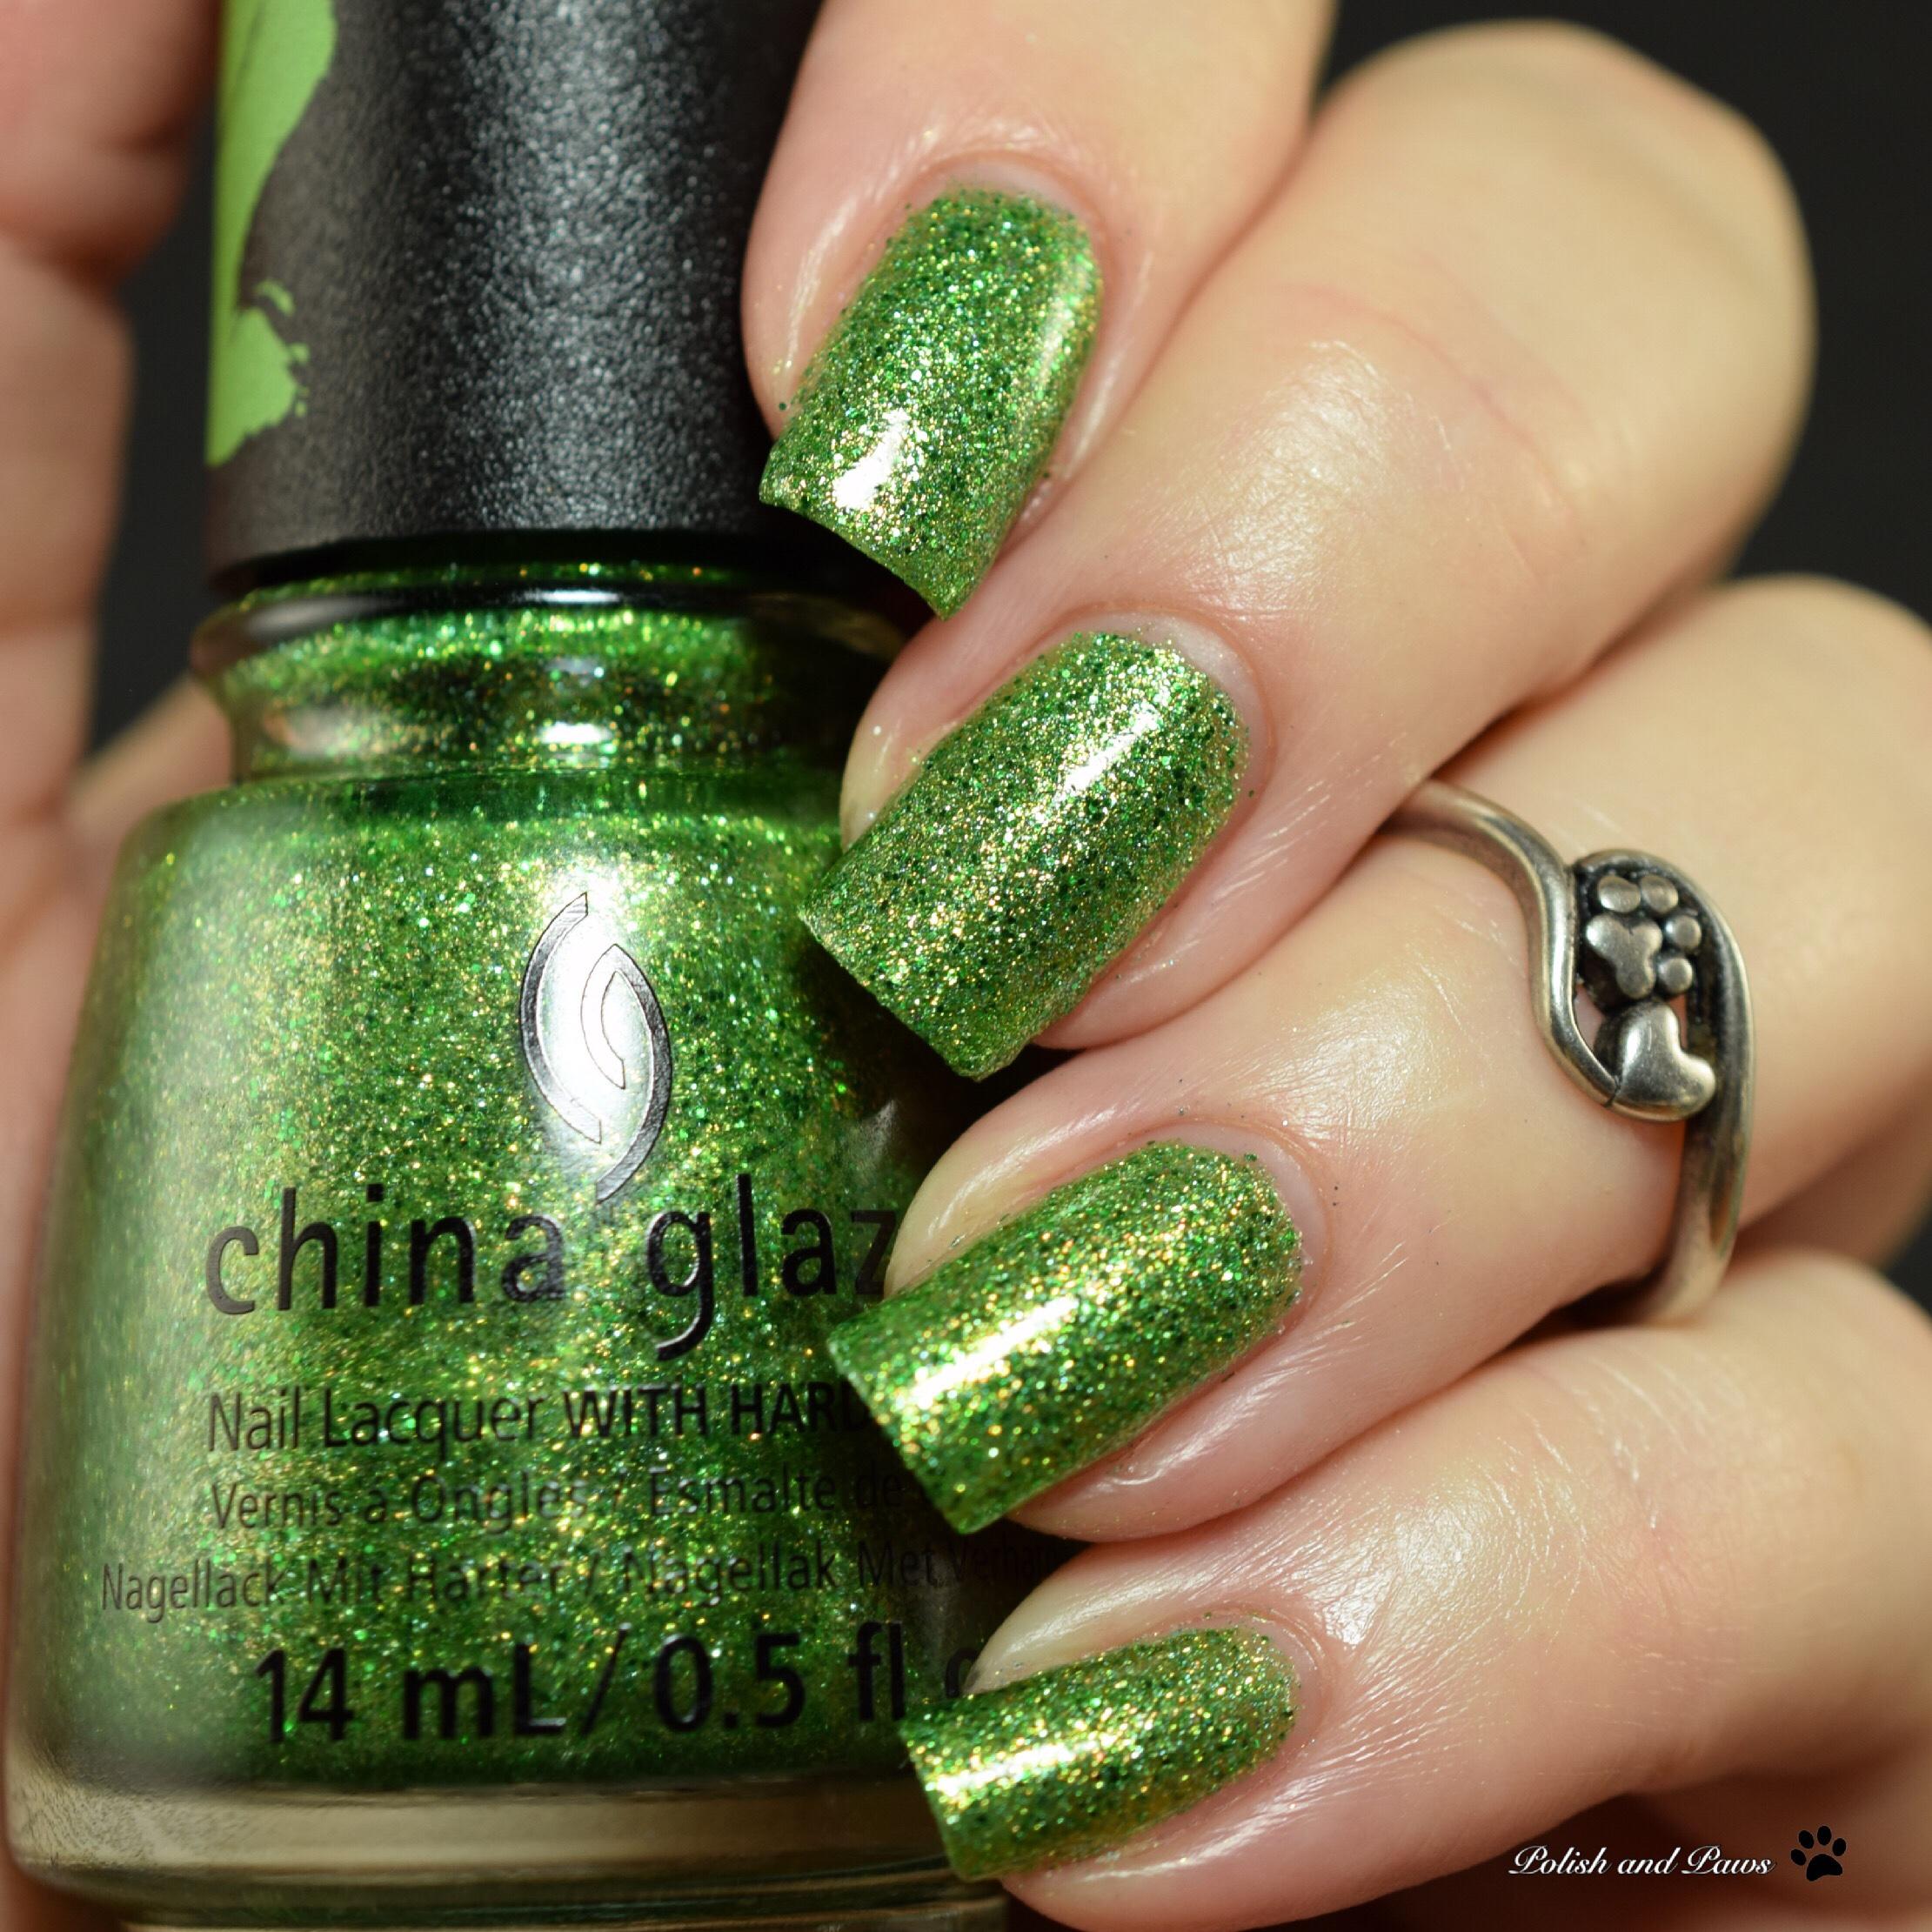 China Glaze Grinchworthy